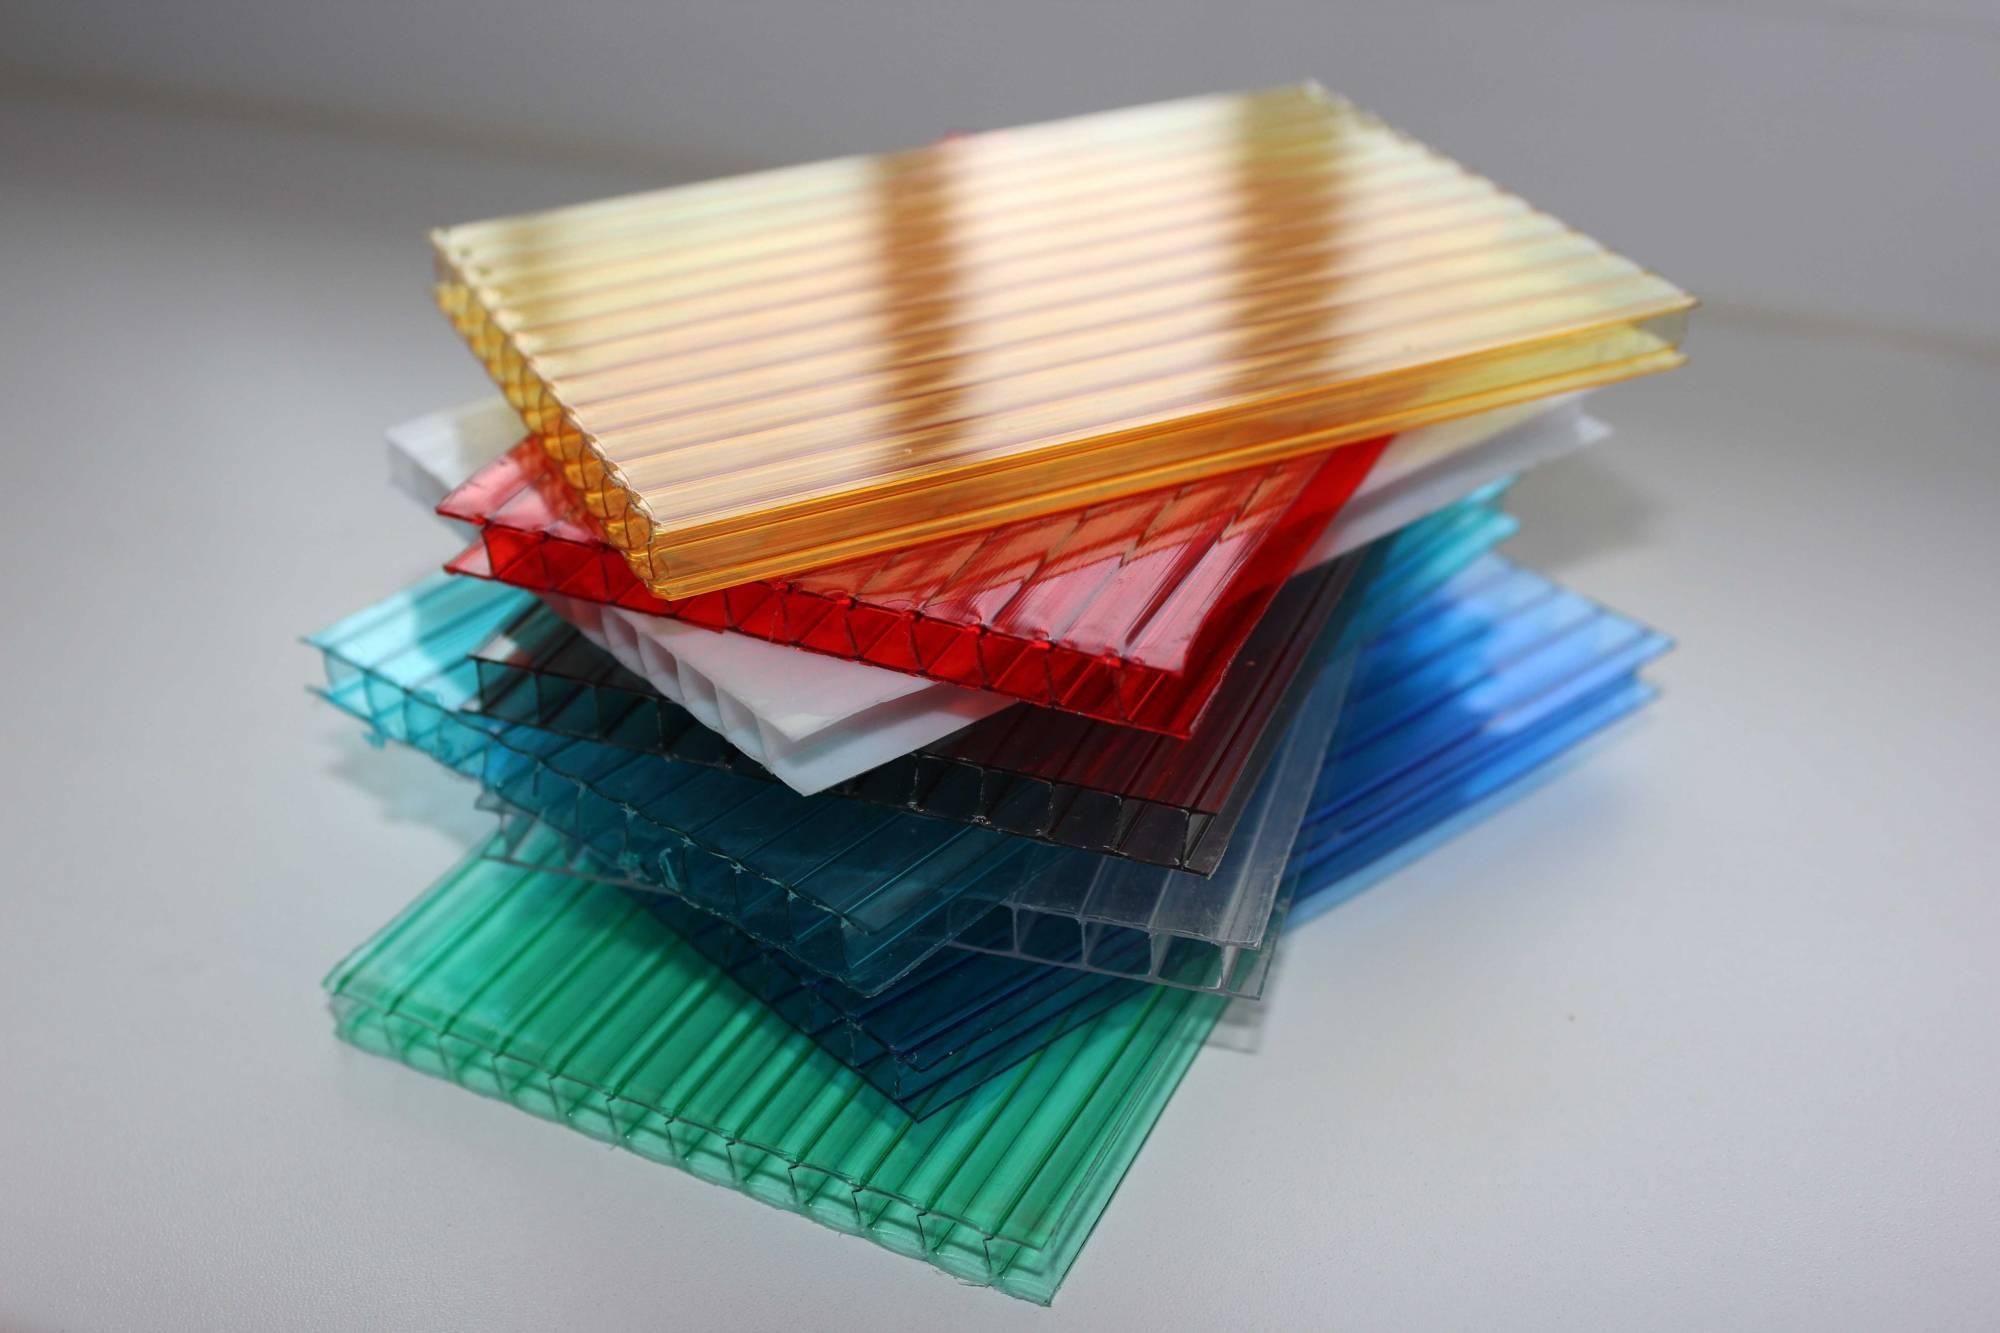 пластмассовые материалы картинки наконец